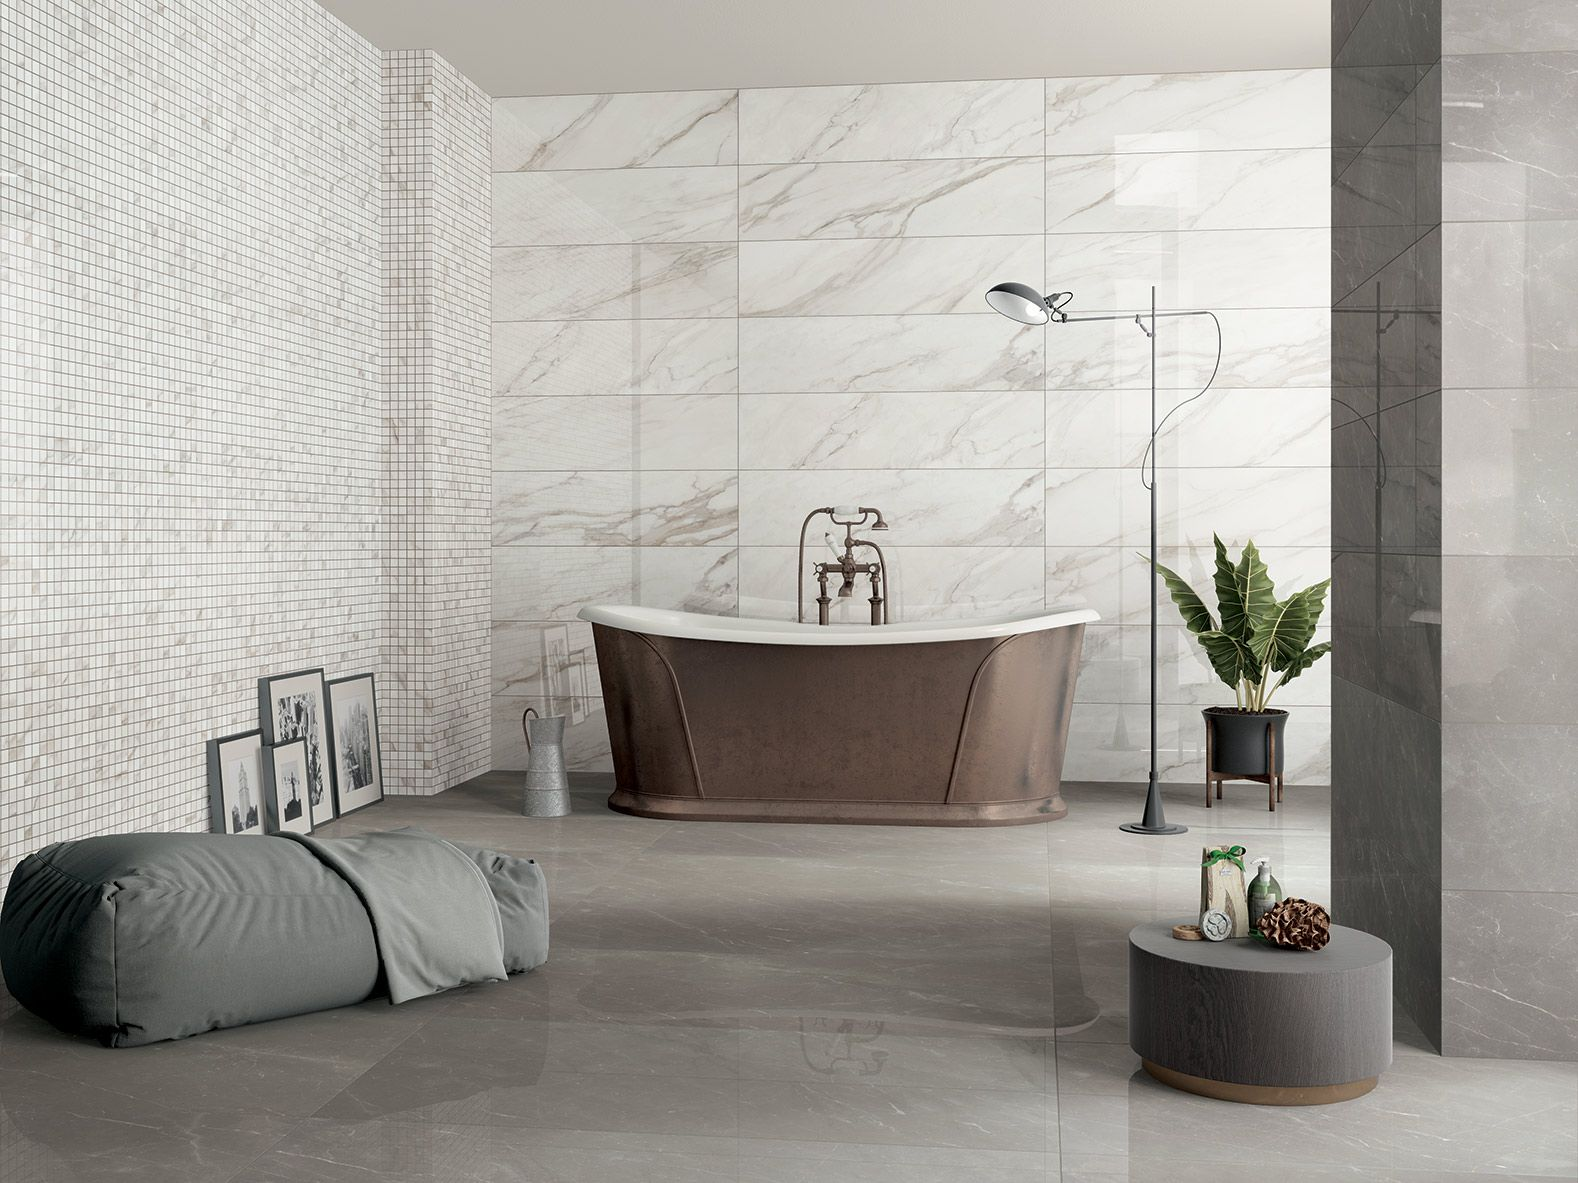 Rivestimenti Leroy Merlin Bagno immagini di bagni moderni arredati